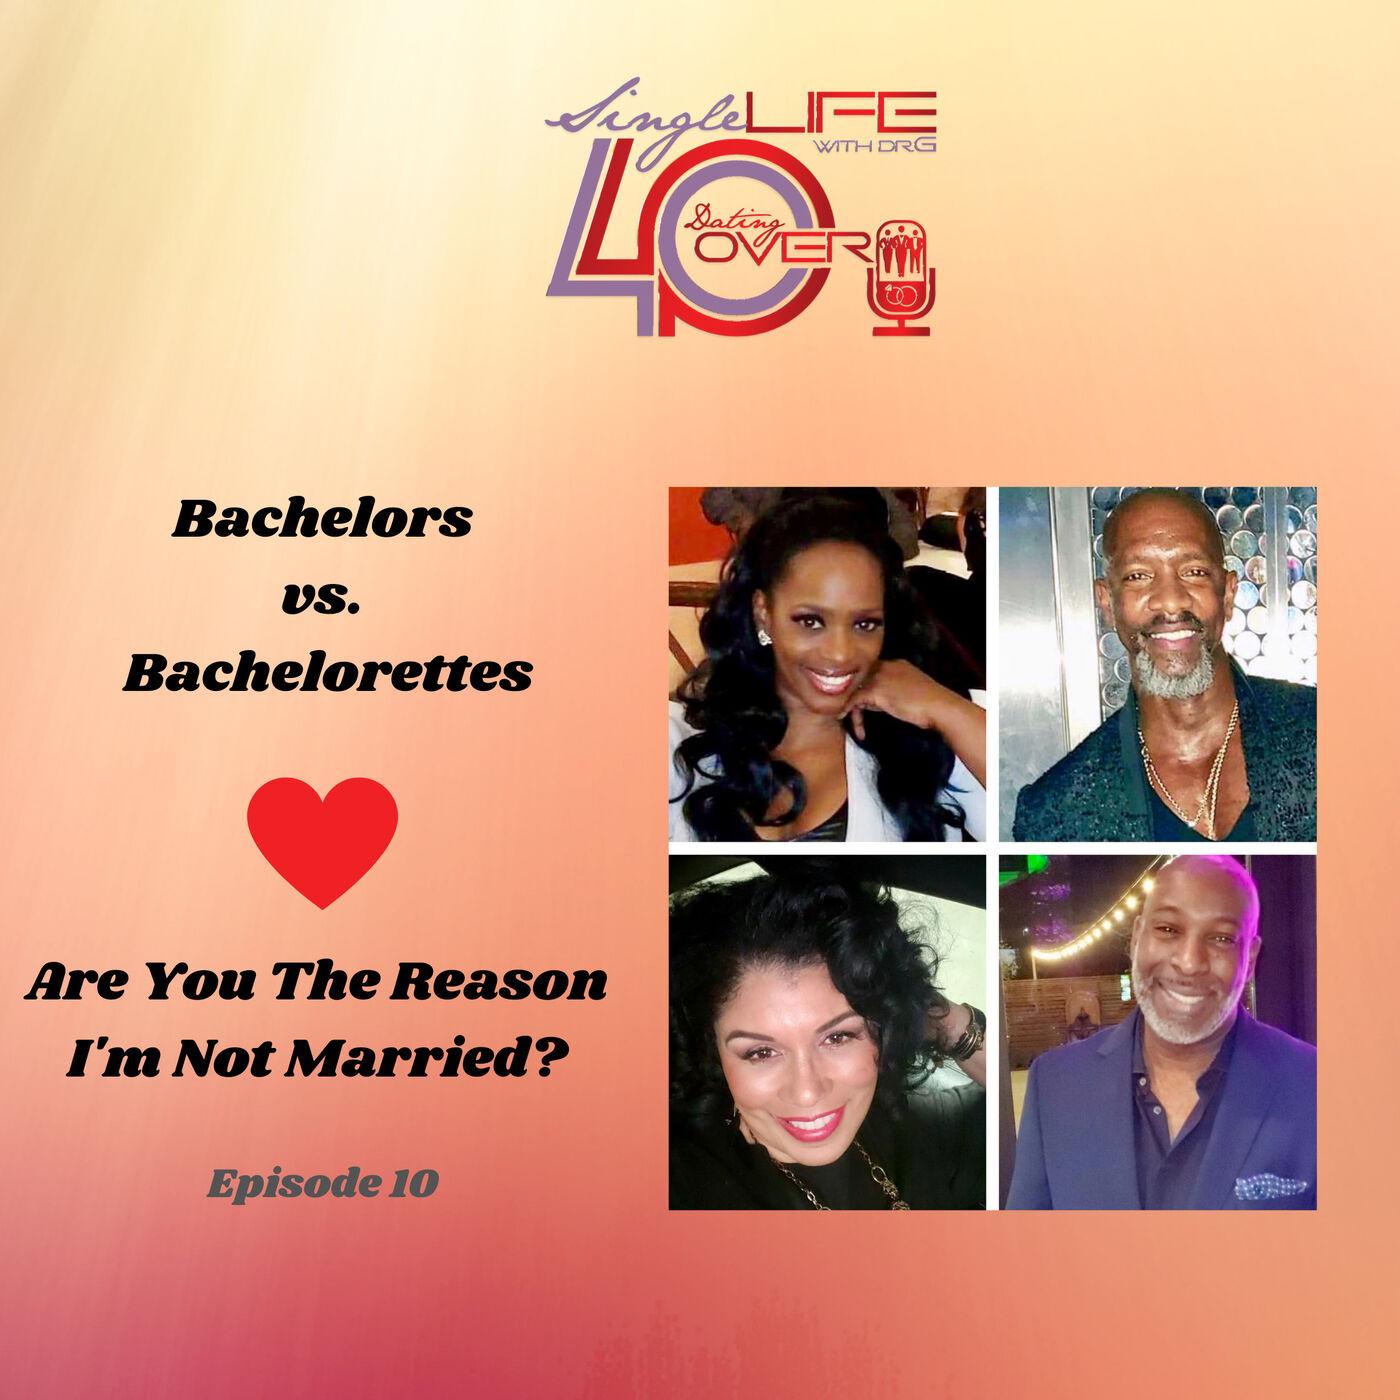 Bachelors vs. Bachelorettes: Are You the Reason I'm Not Married?